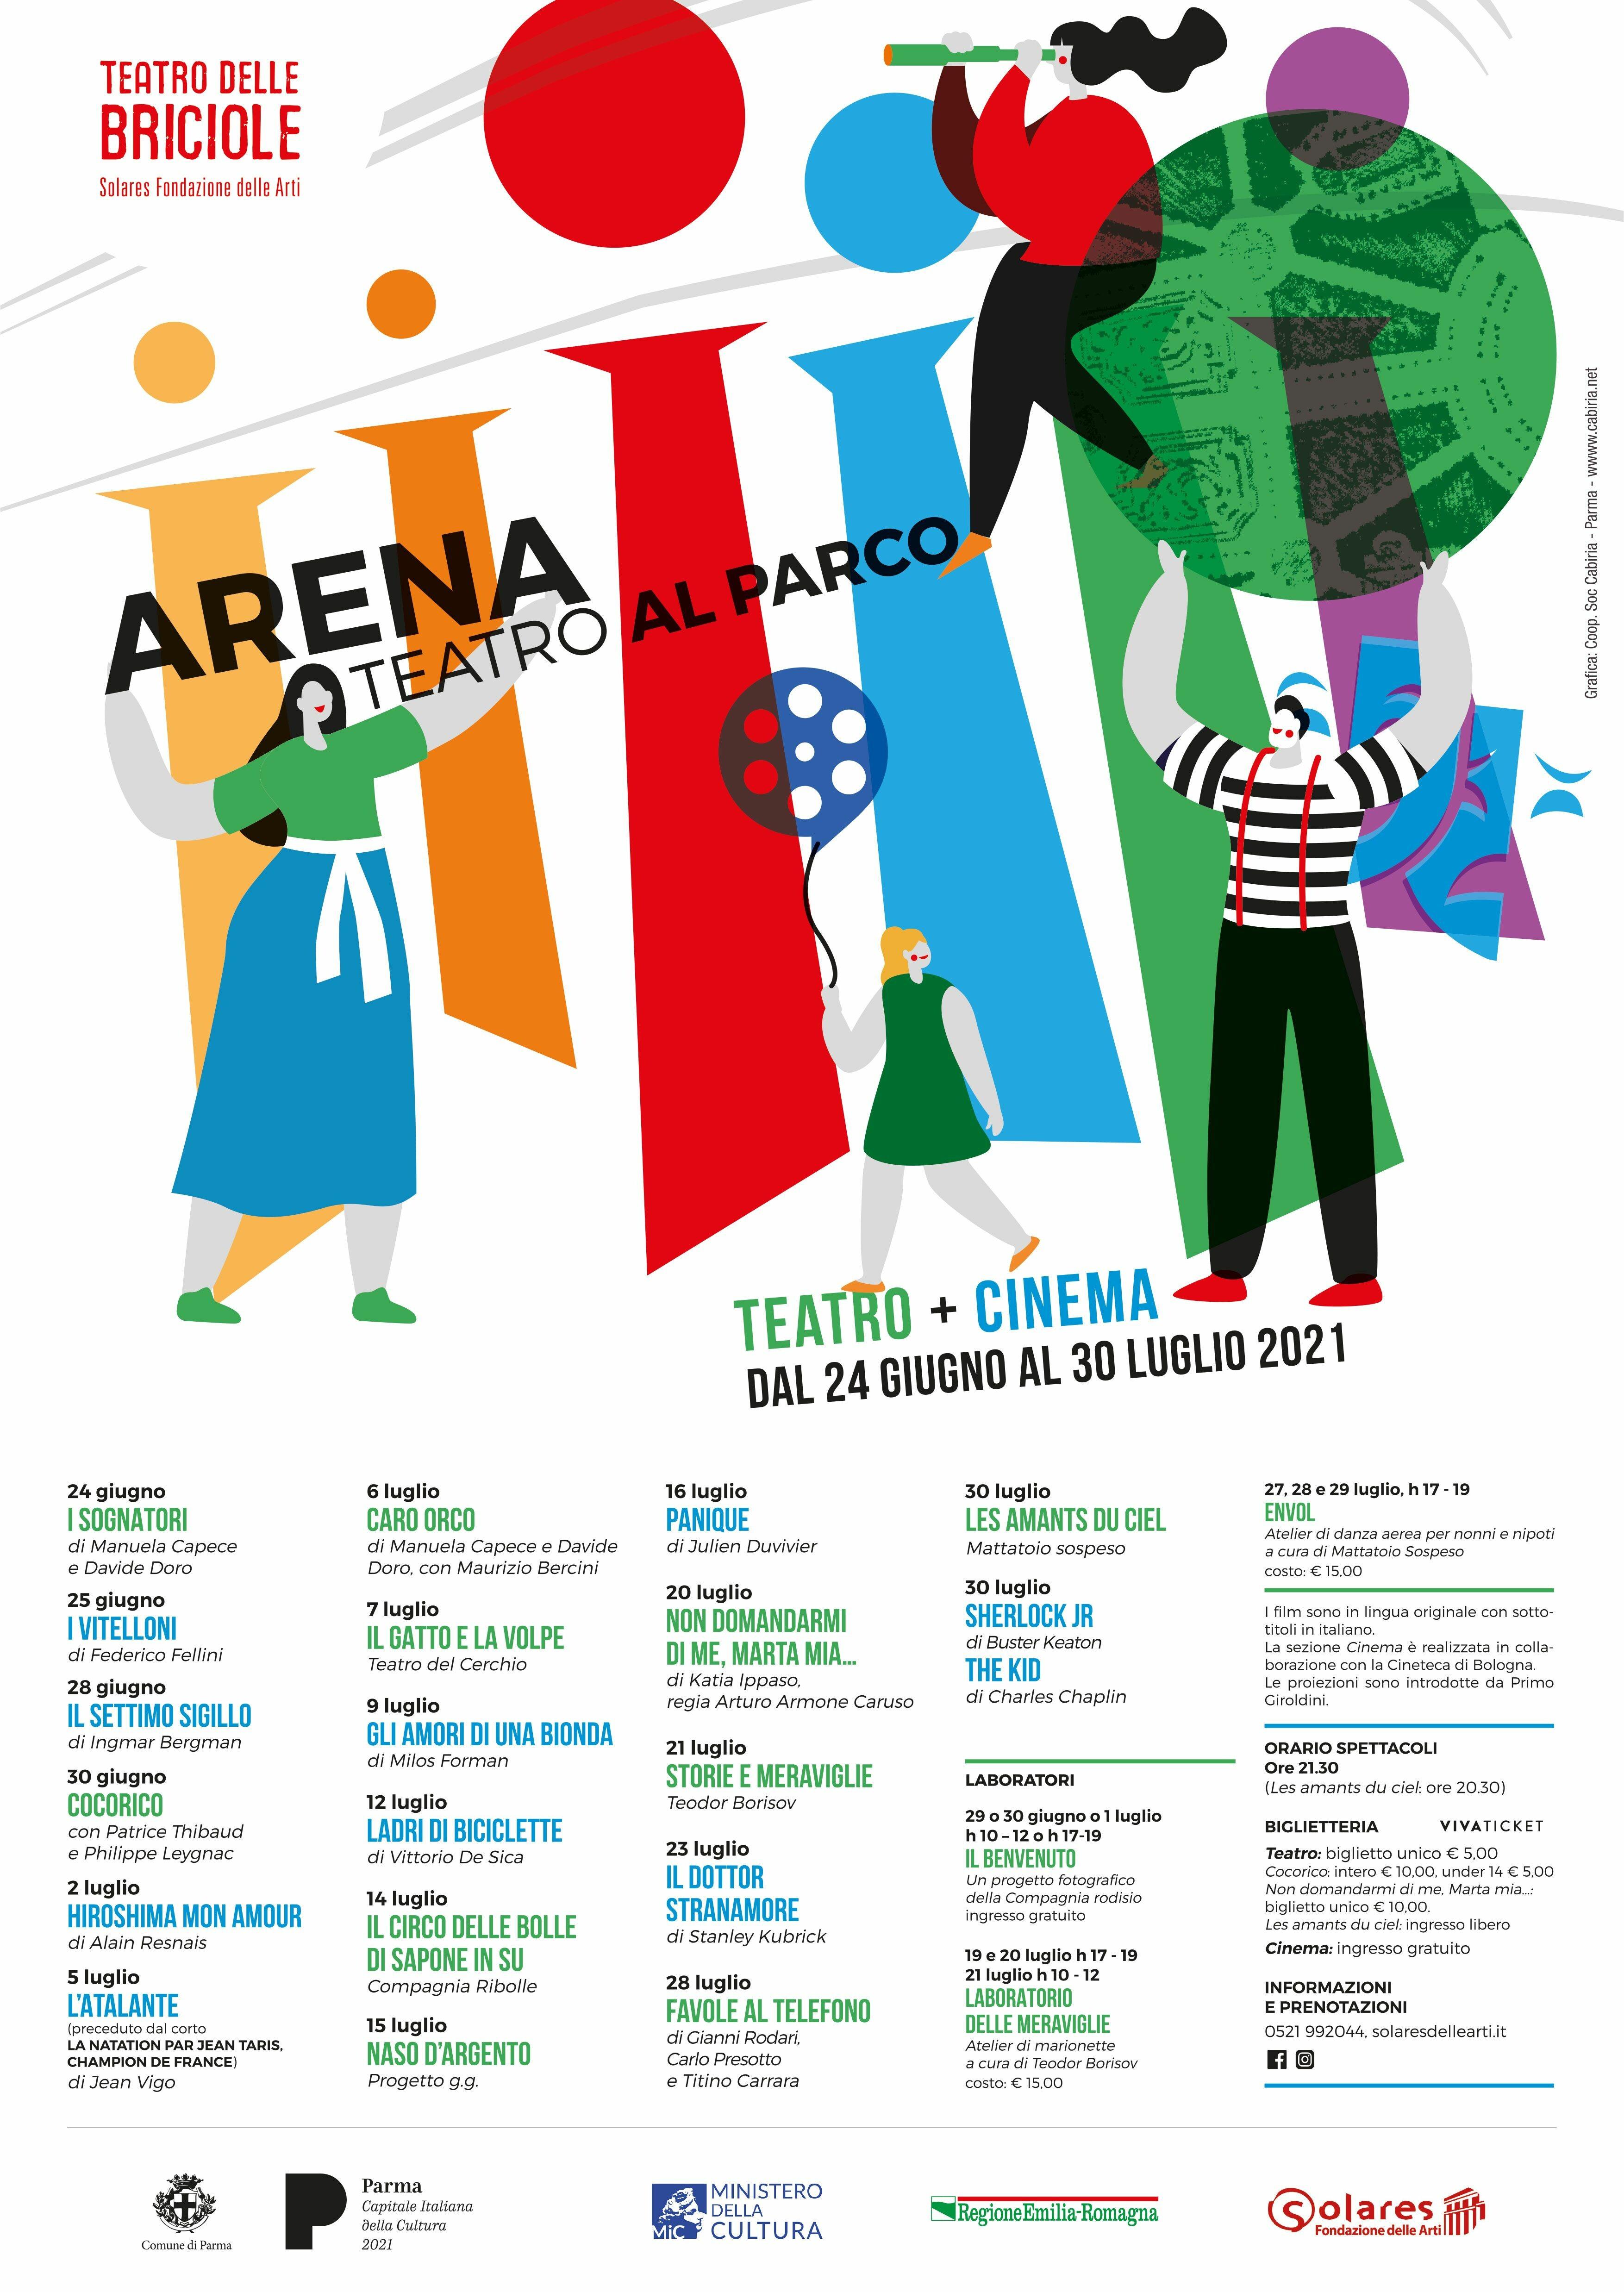 «ARENA TEATRO AL PARCO. Teatro + cinema»